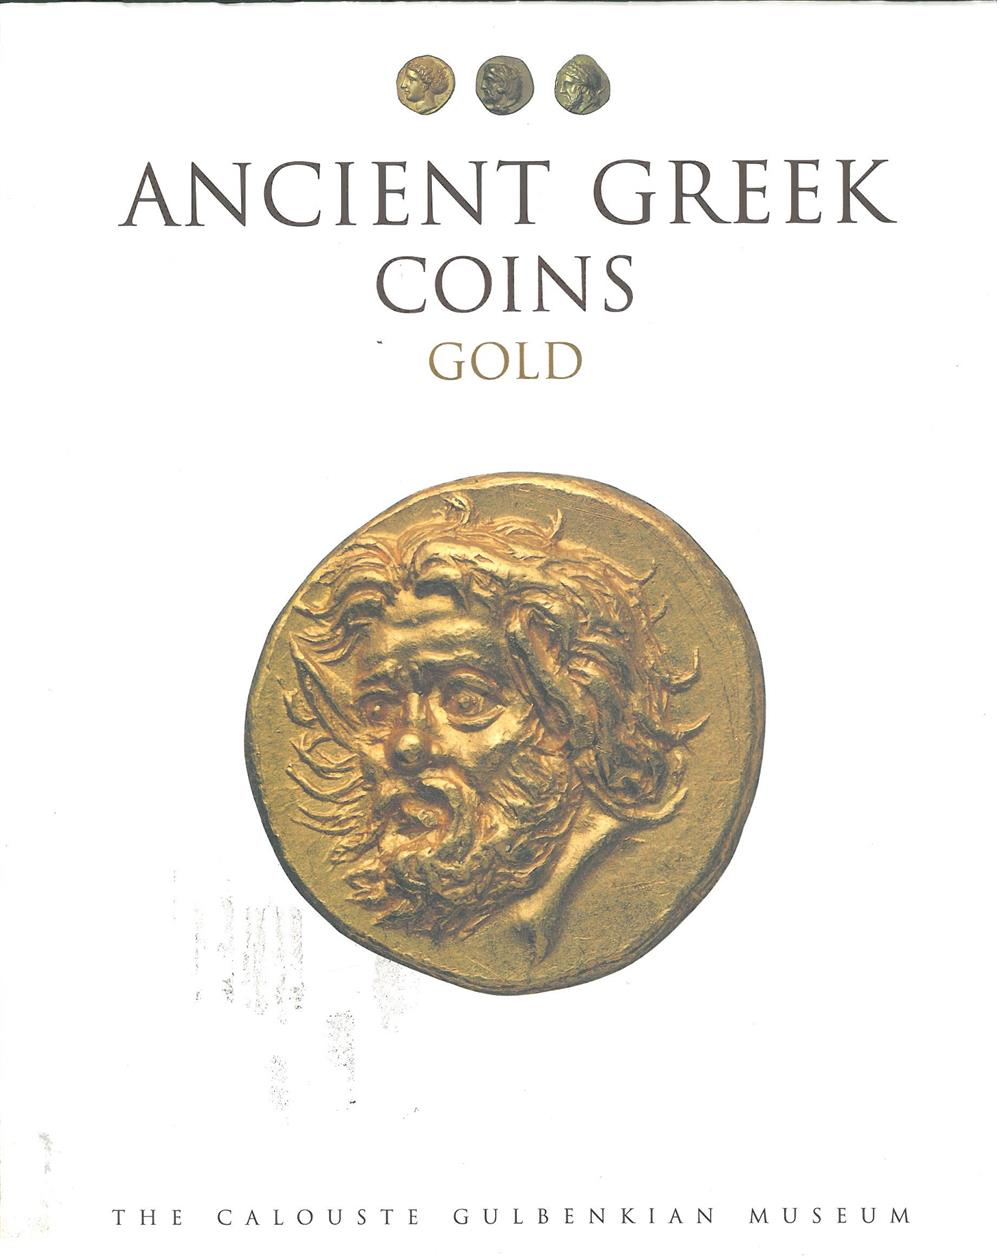 Ancient greek coins gold.jpg